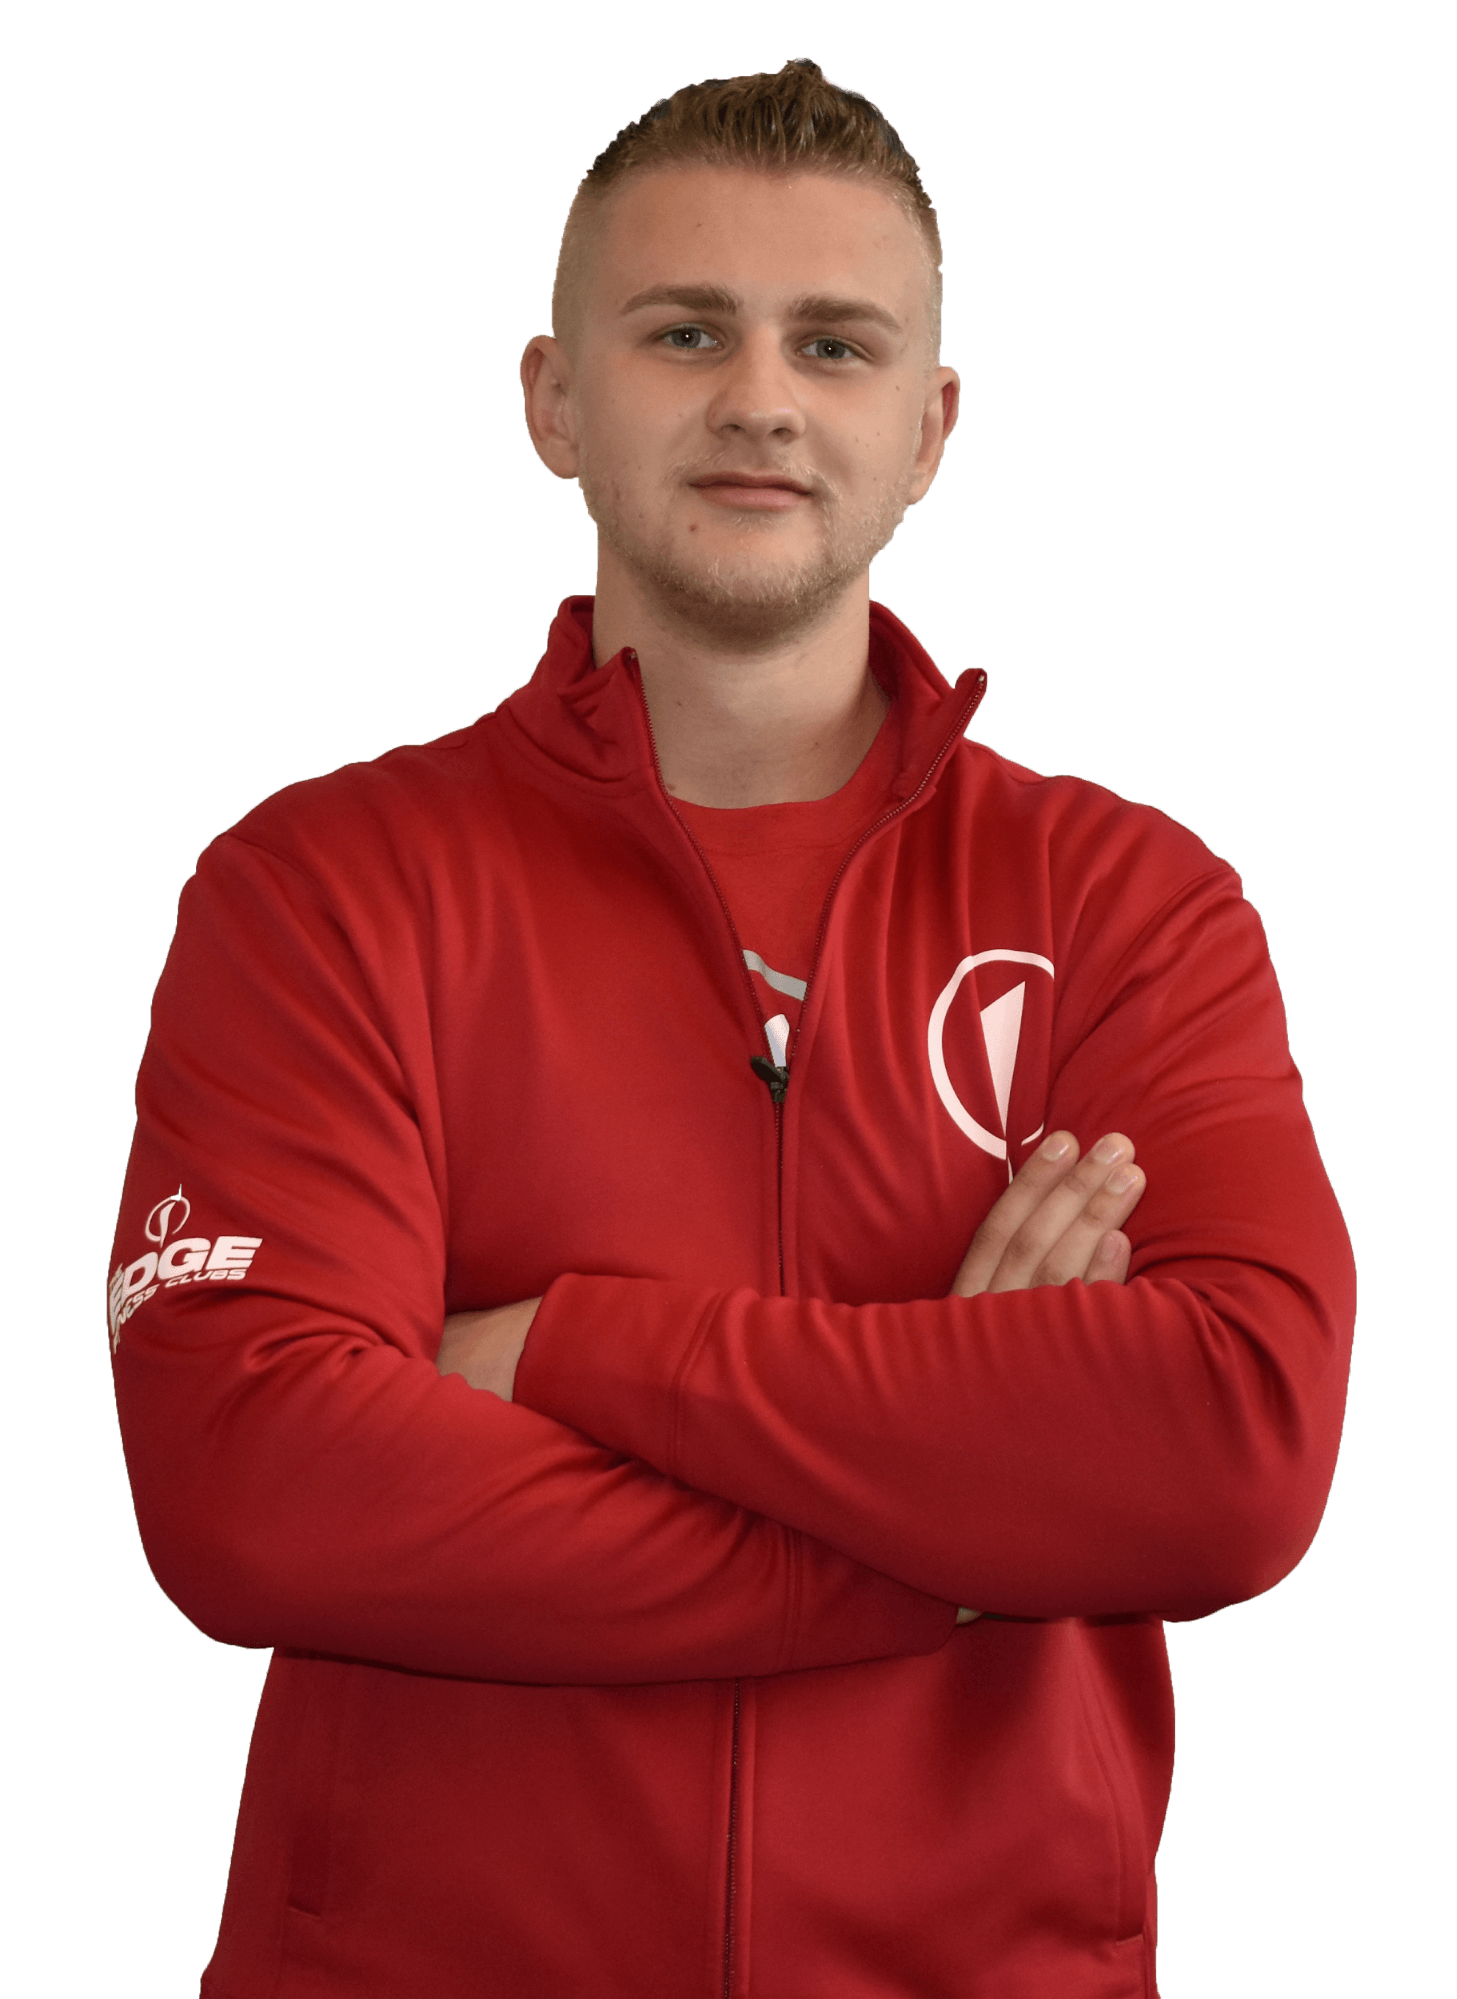 Dominik Sidorczuk